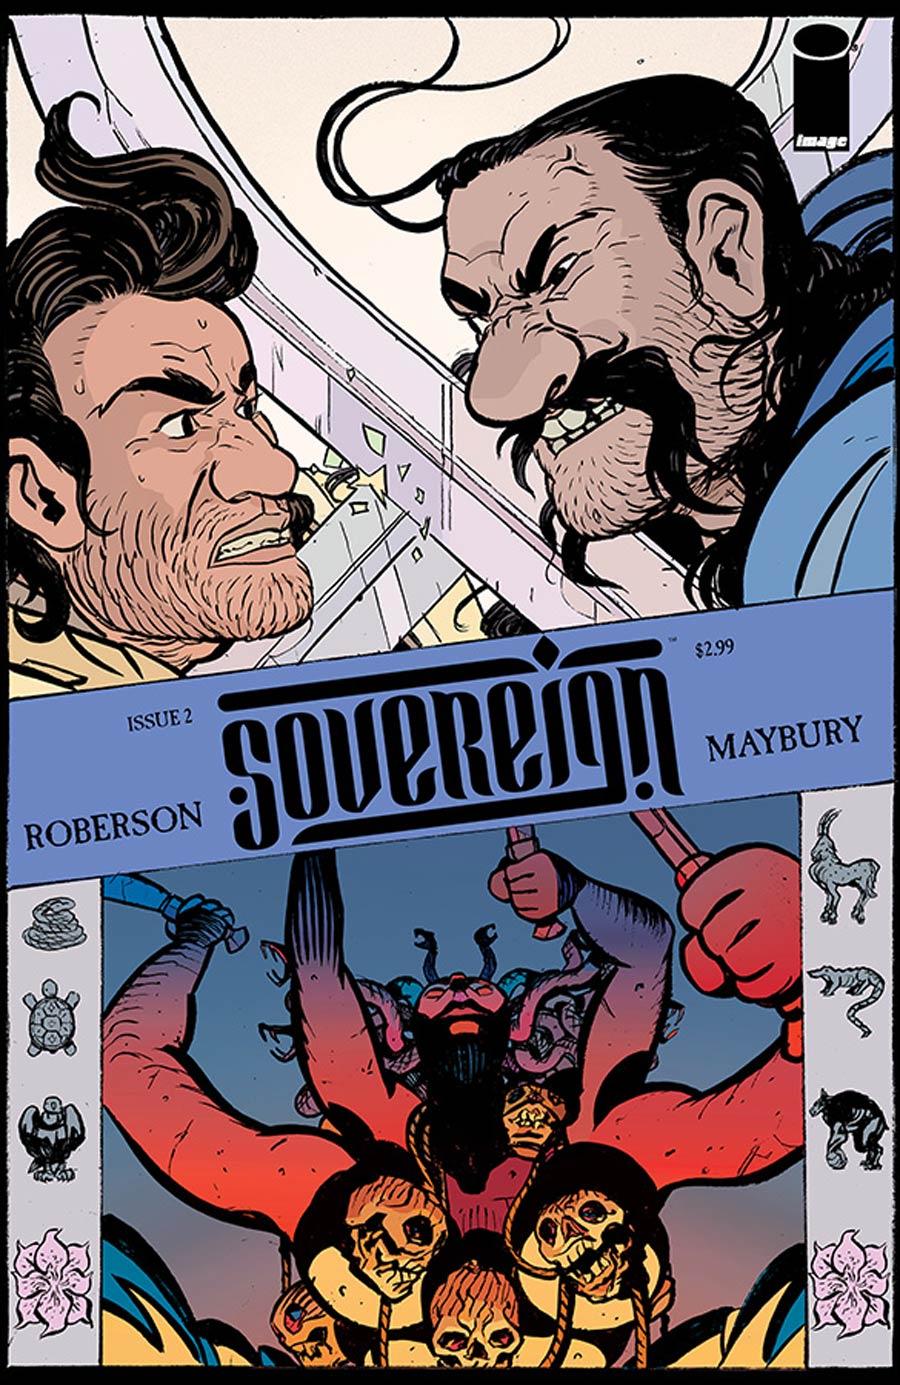 Sovereign #2